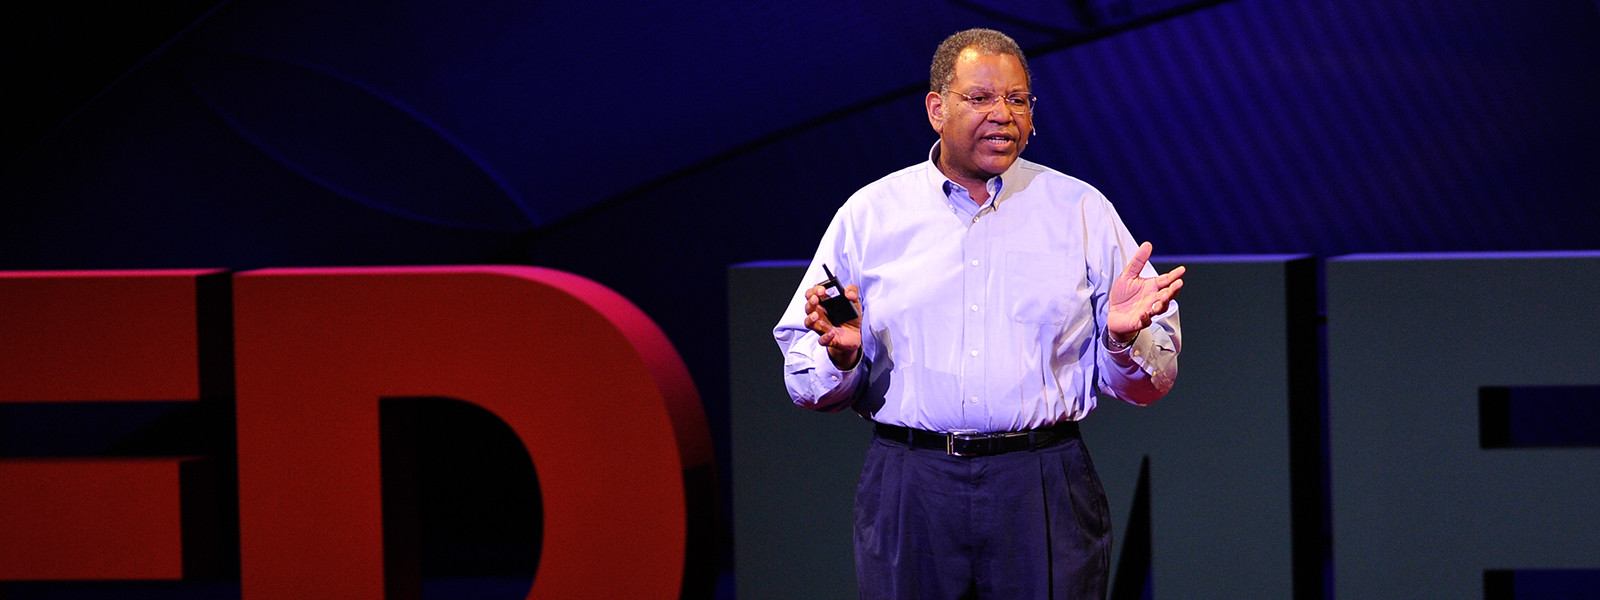 TEDMED - Talk Details - War on cancer, year 40: who's winning?